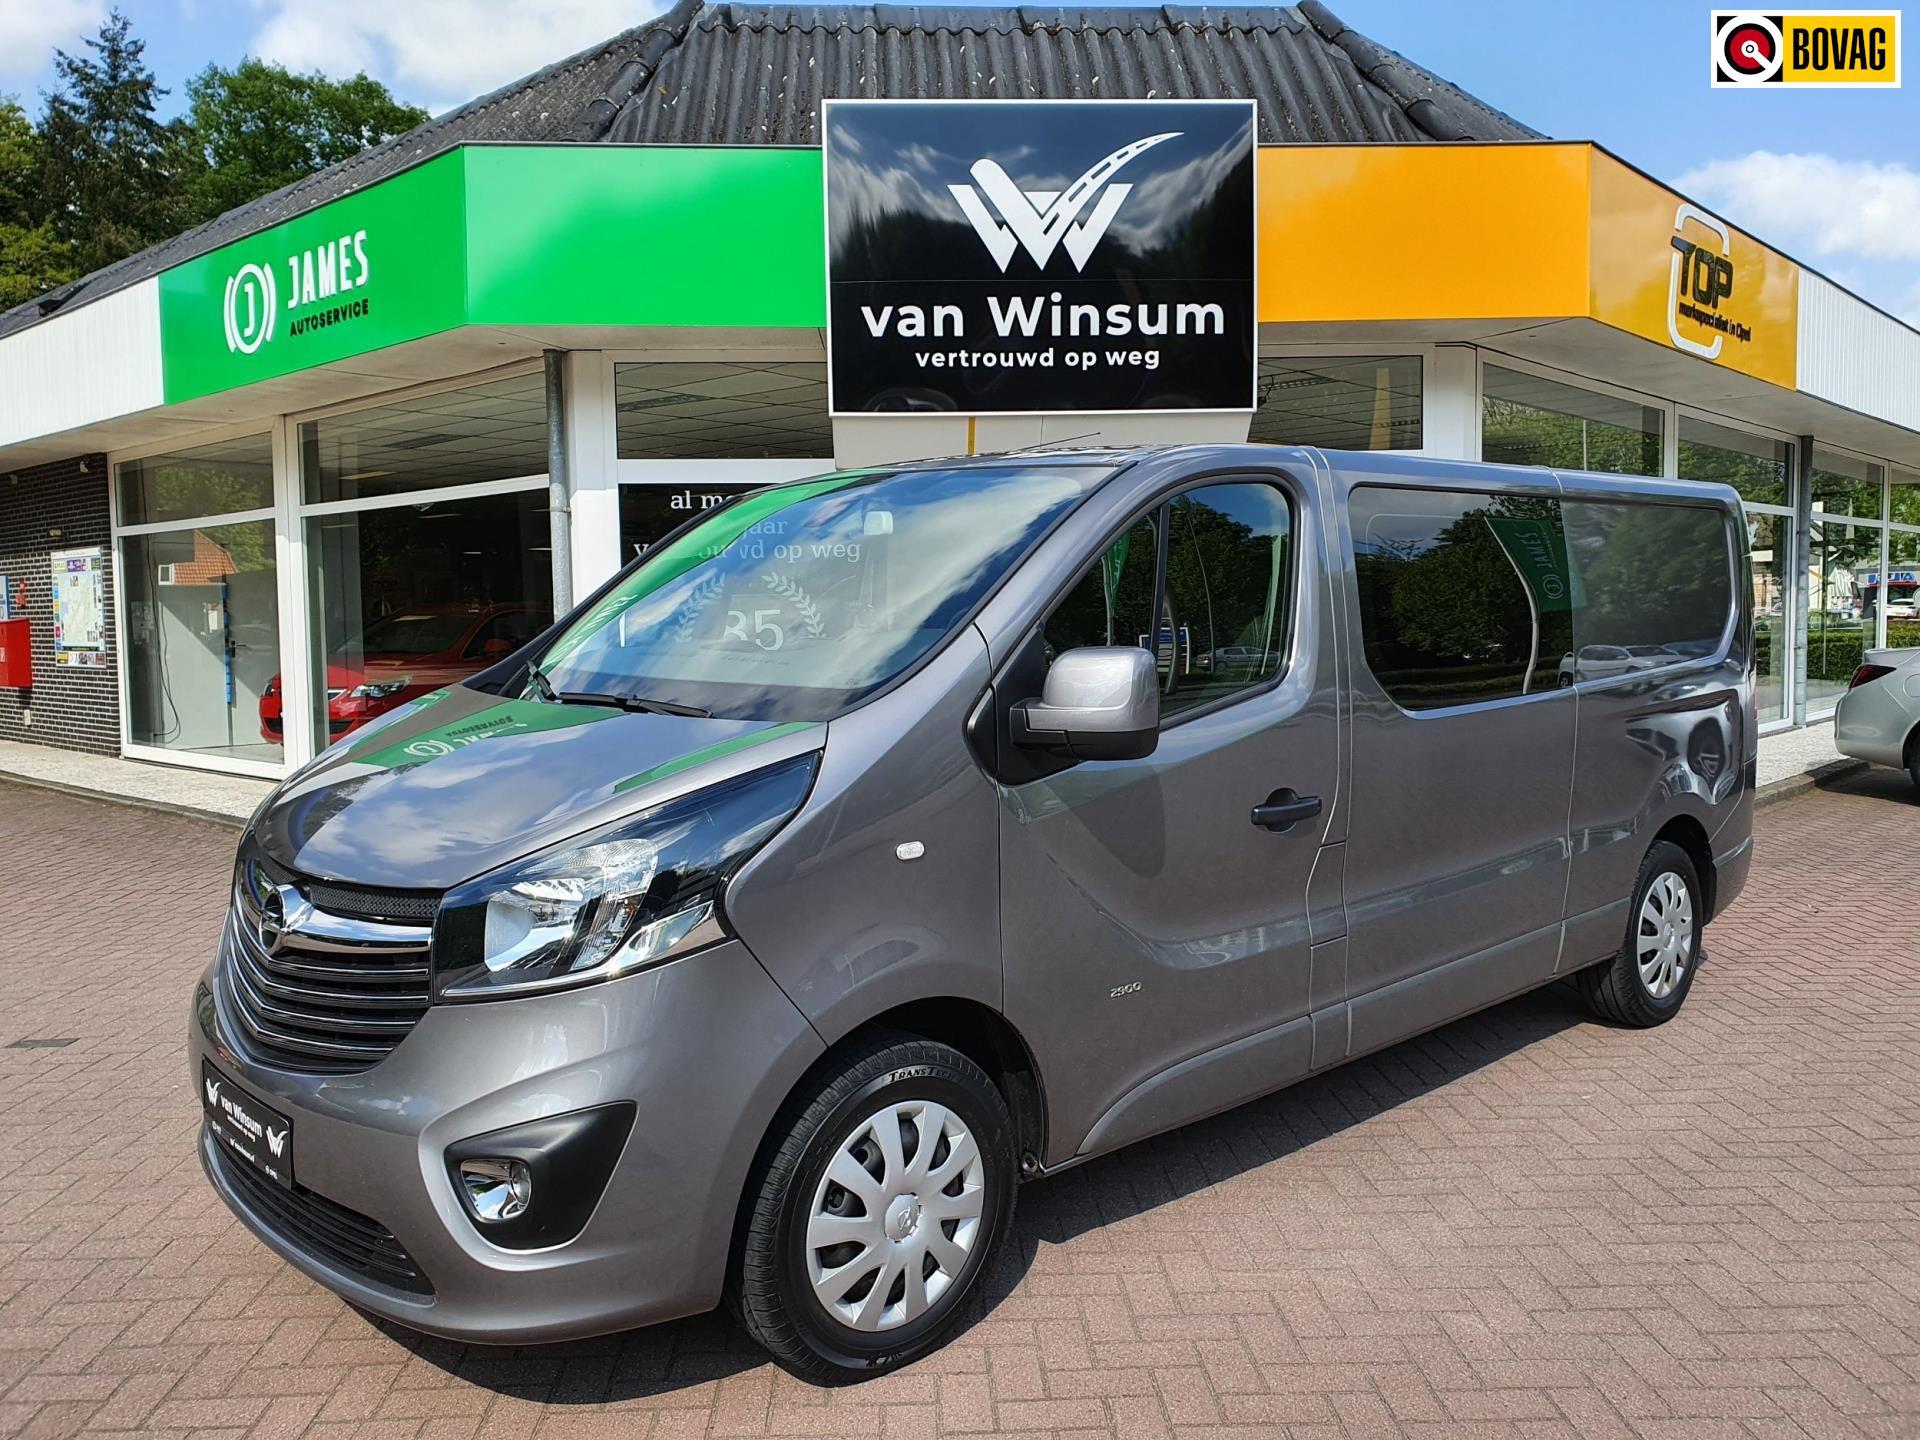 Opel Vivaro occasion - Autobedrijf G. Van Winsum B.V.